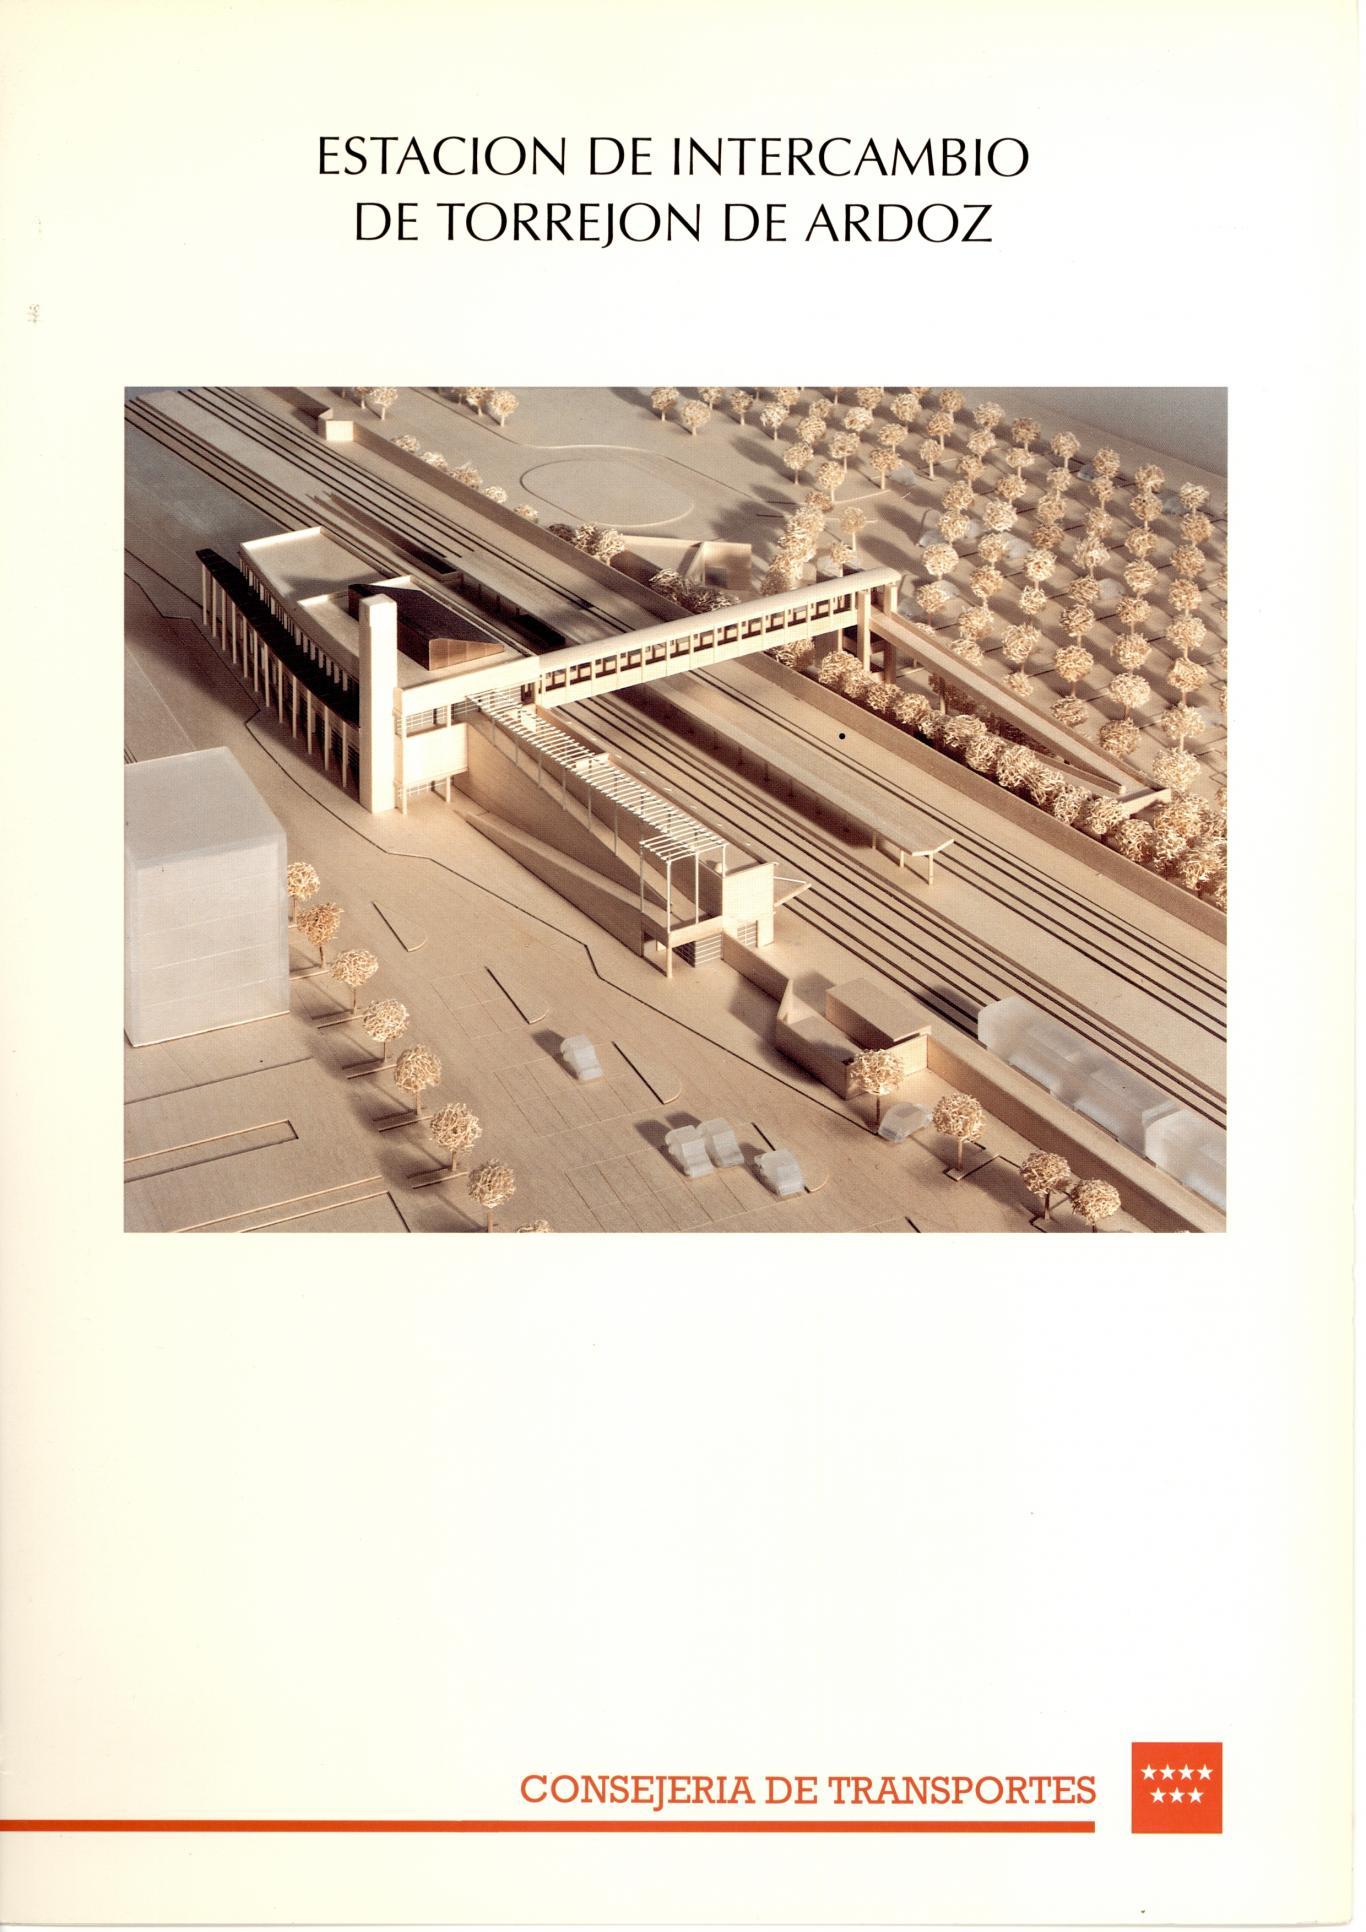 Carátula folleto estac interc Torrejón